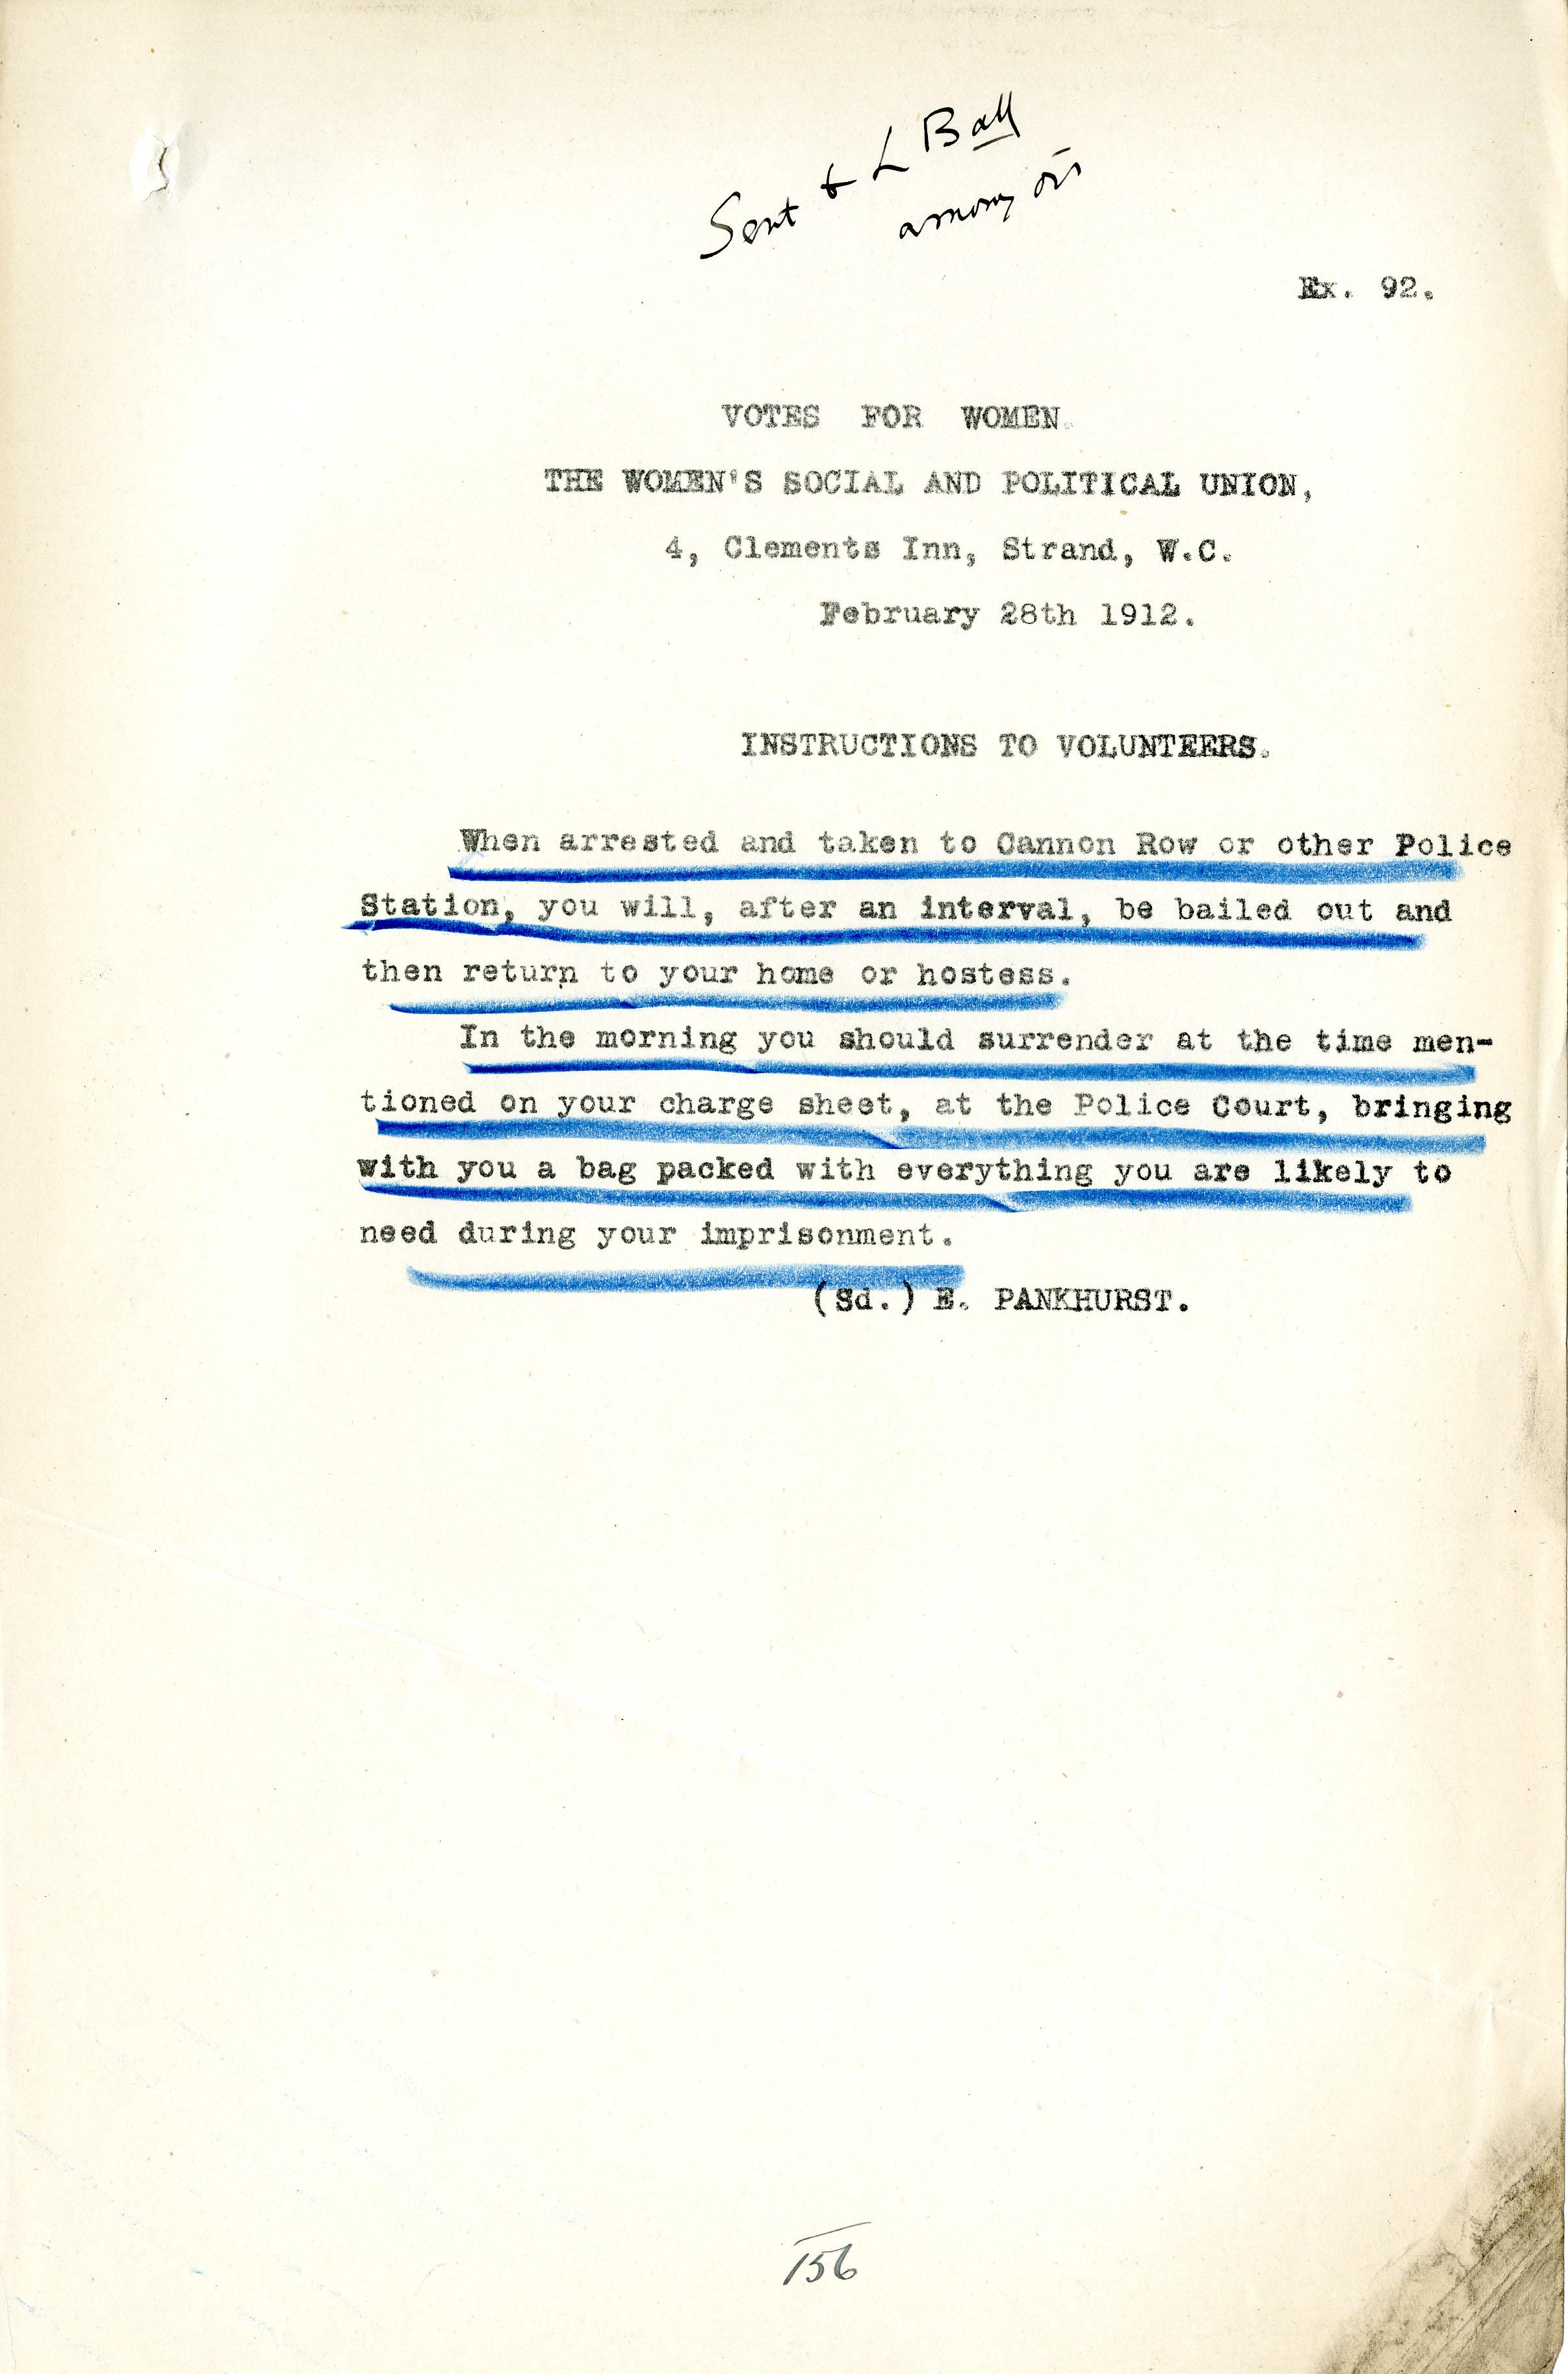 Instructions to volunteers 28 February 1912 DPP1-23 Ex92